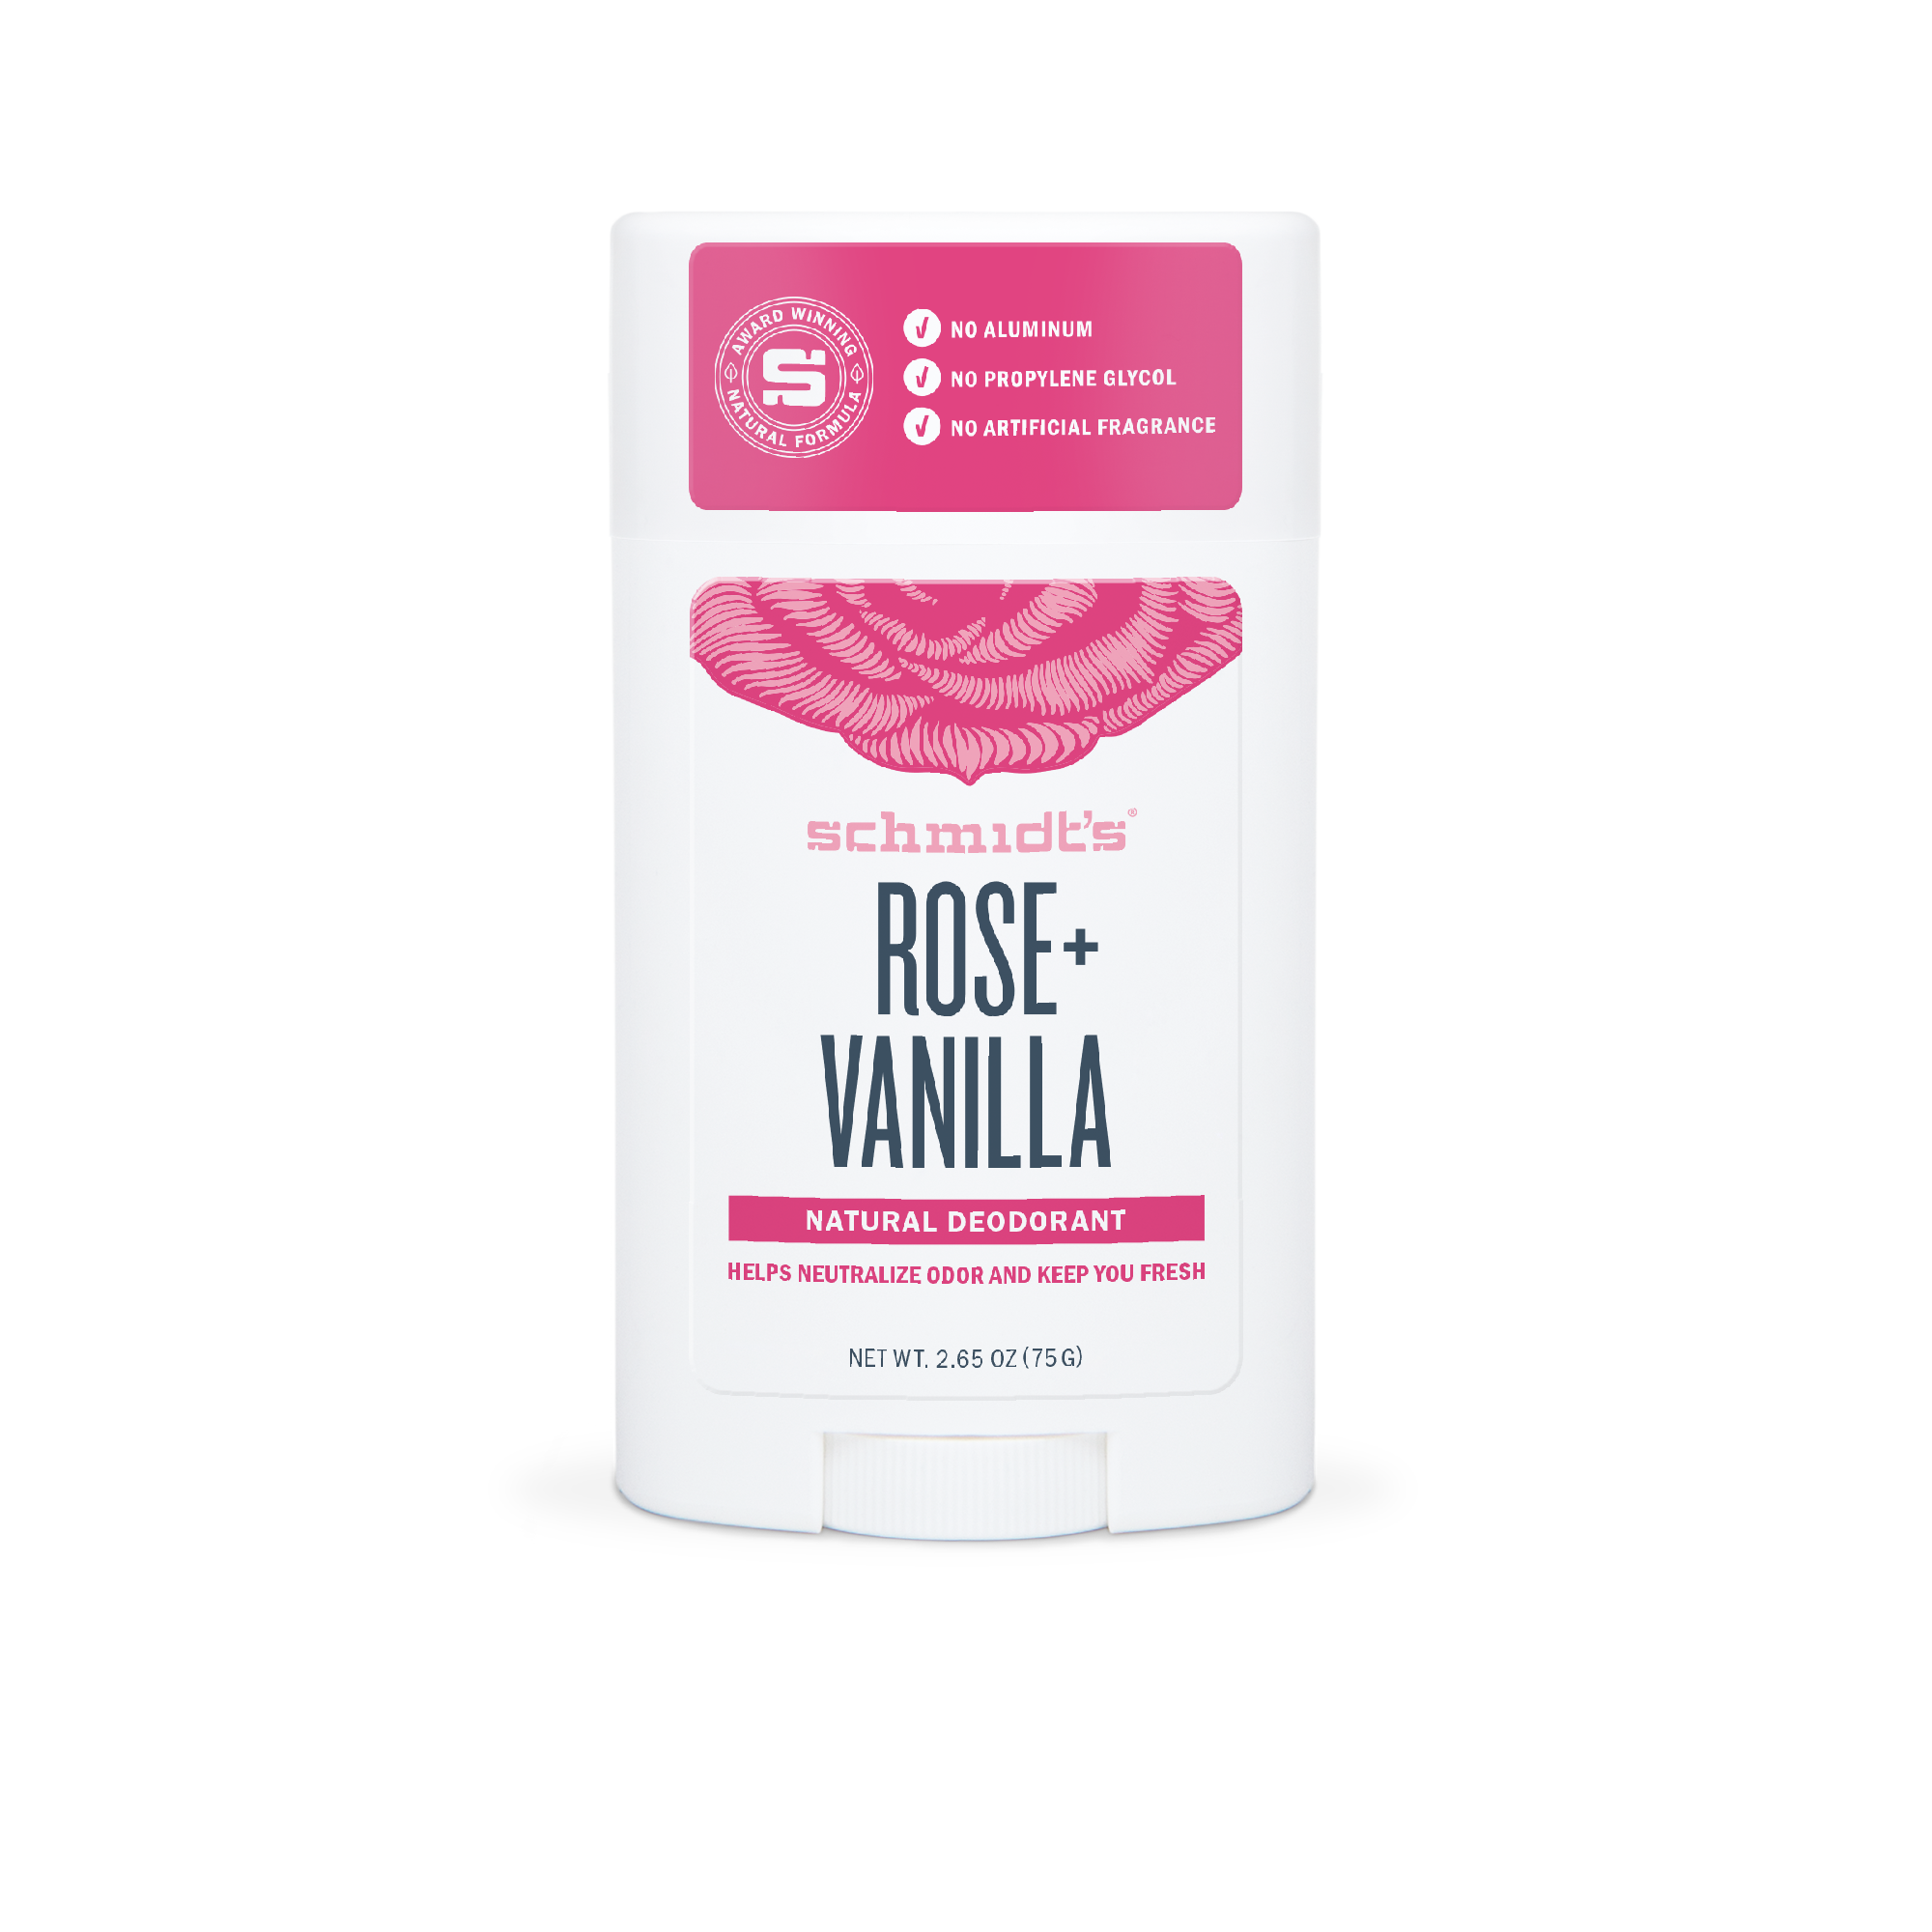 Schmidt's Rose + Vanilla Natural Deodorant Stick, 2.65 Oz